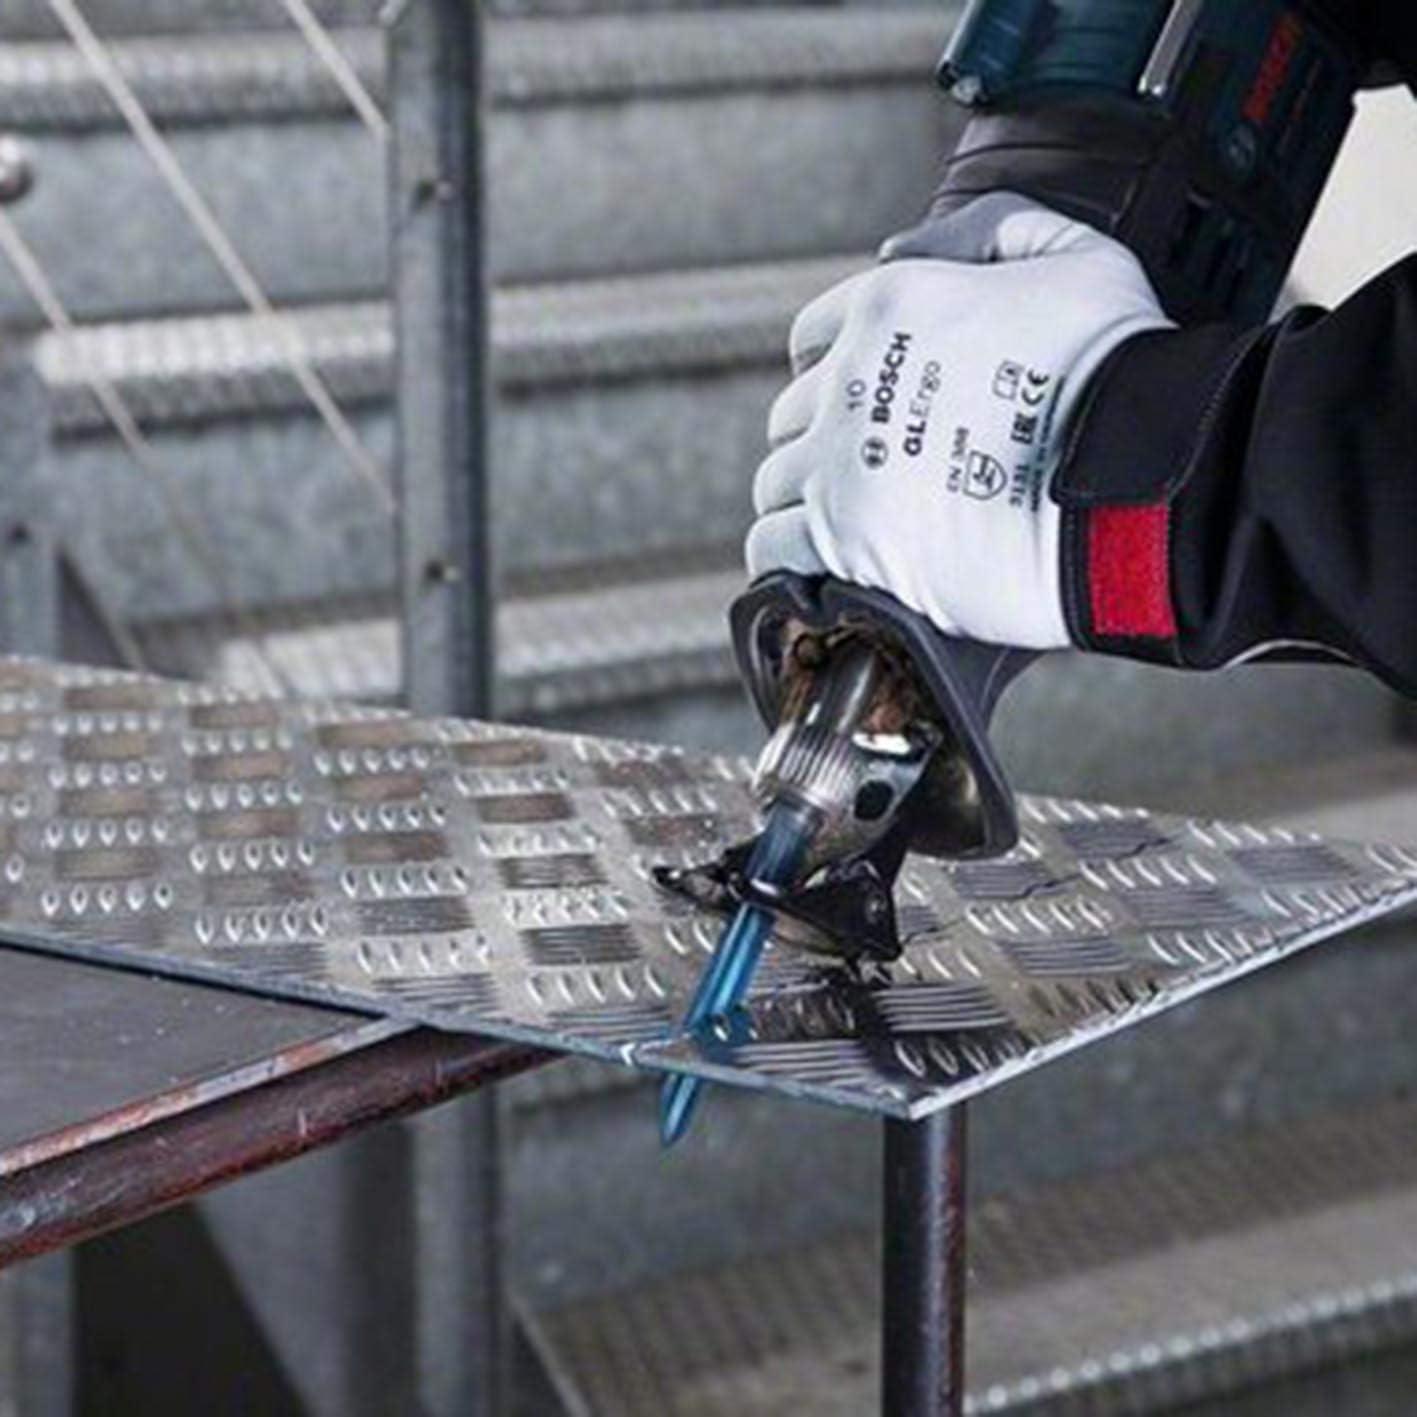 Bosch Lame de scie sabre S 1022 EHM Endurance for StainlessSteel